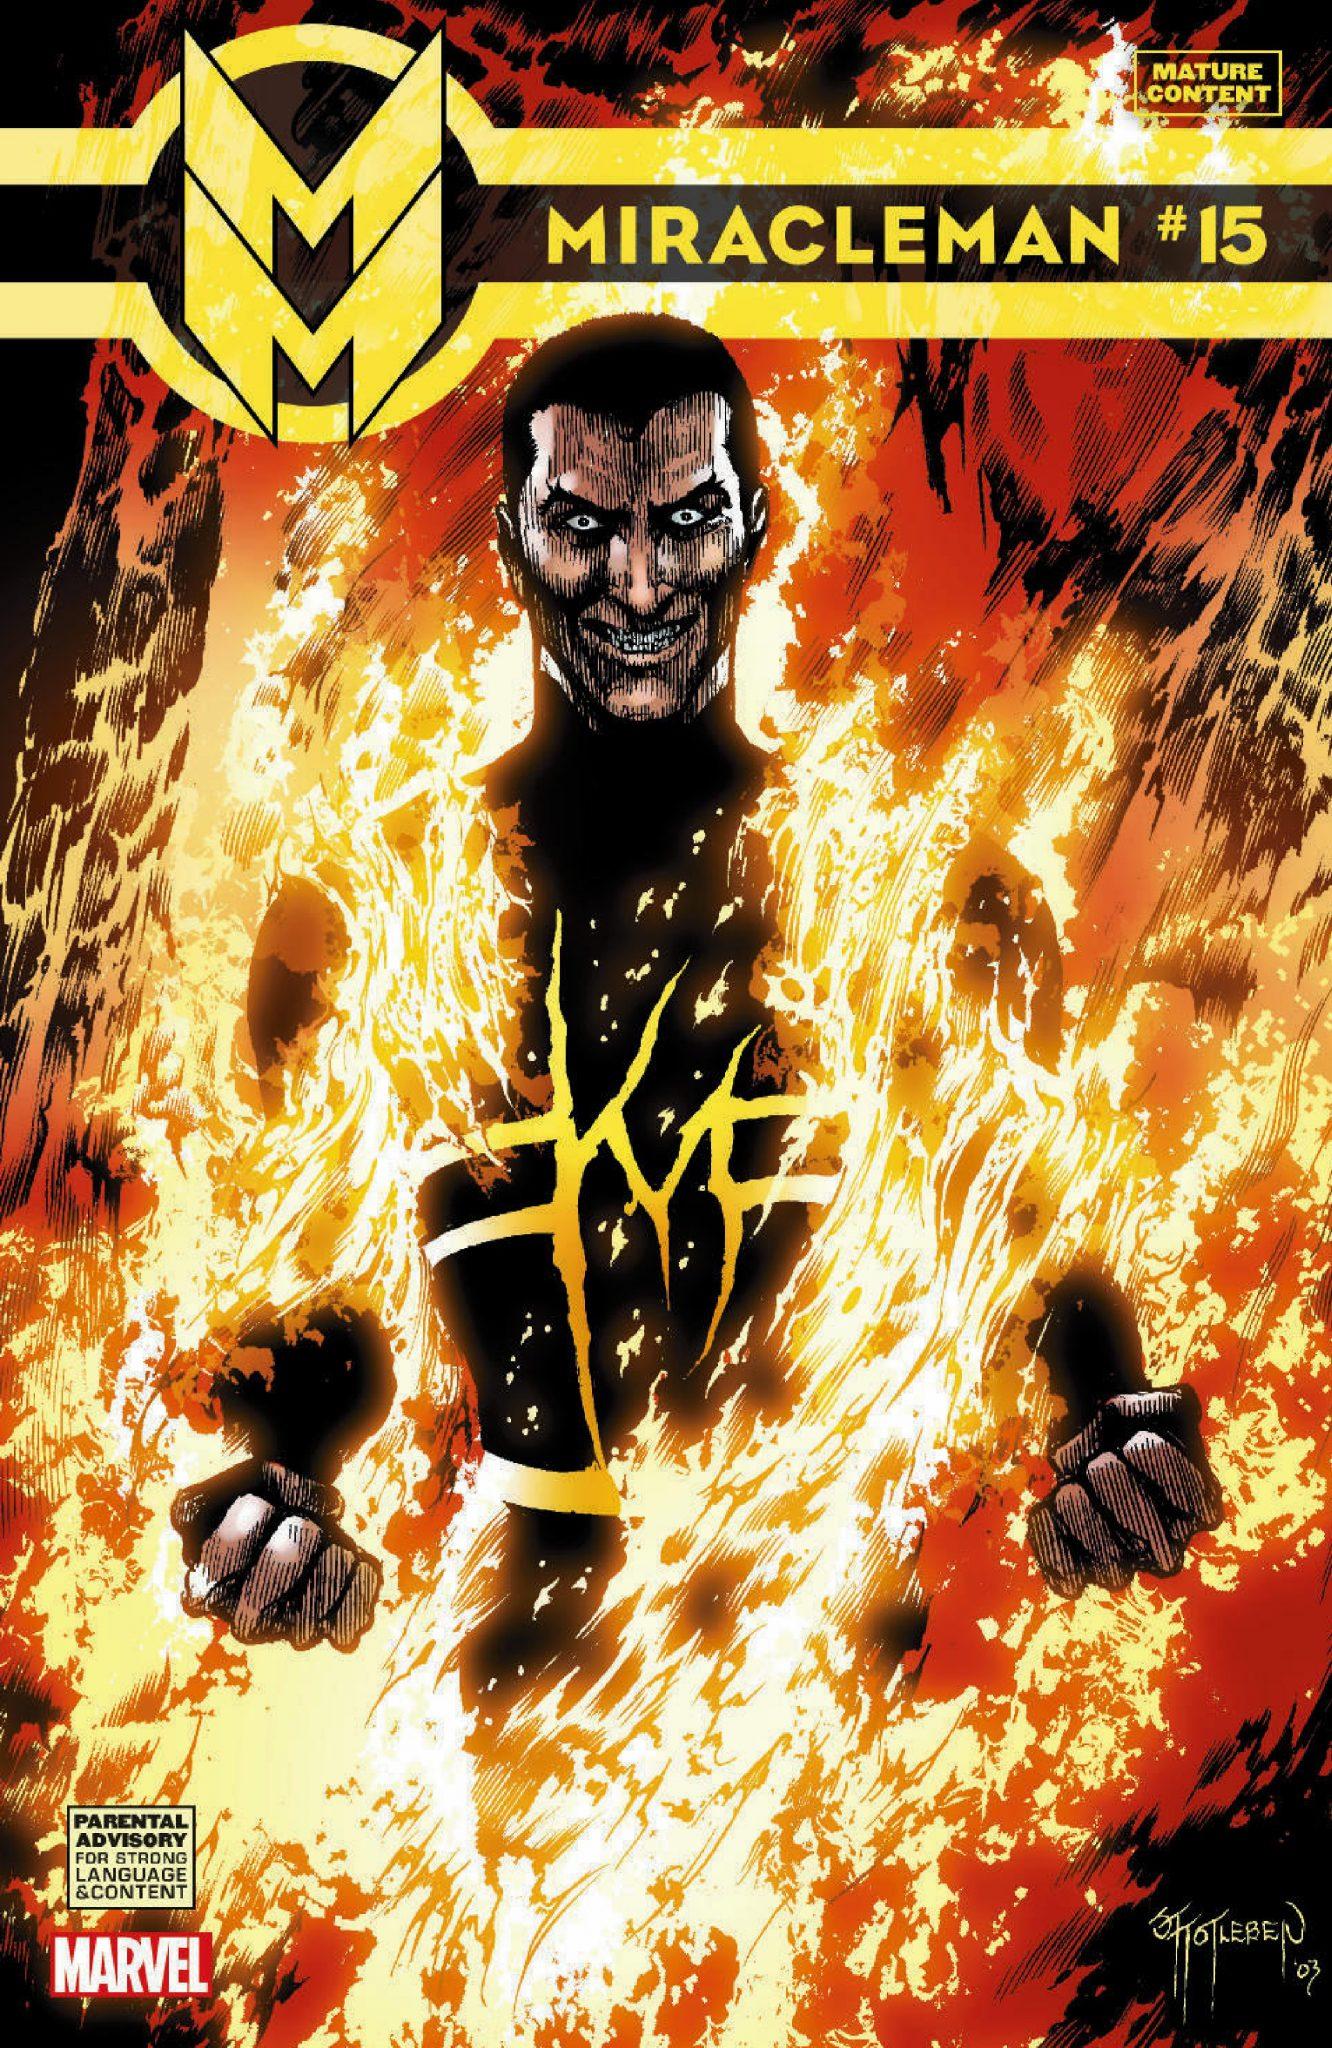 Capa de Miracleman #15, publicada no Brasil pela Panini Comics